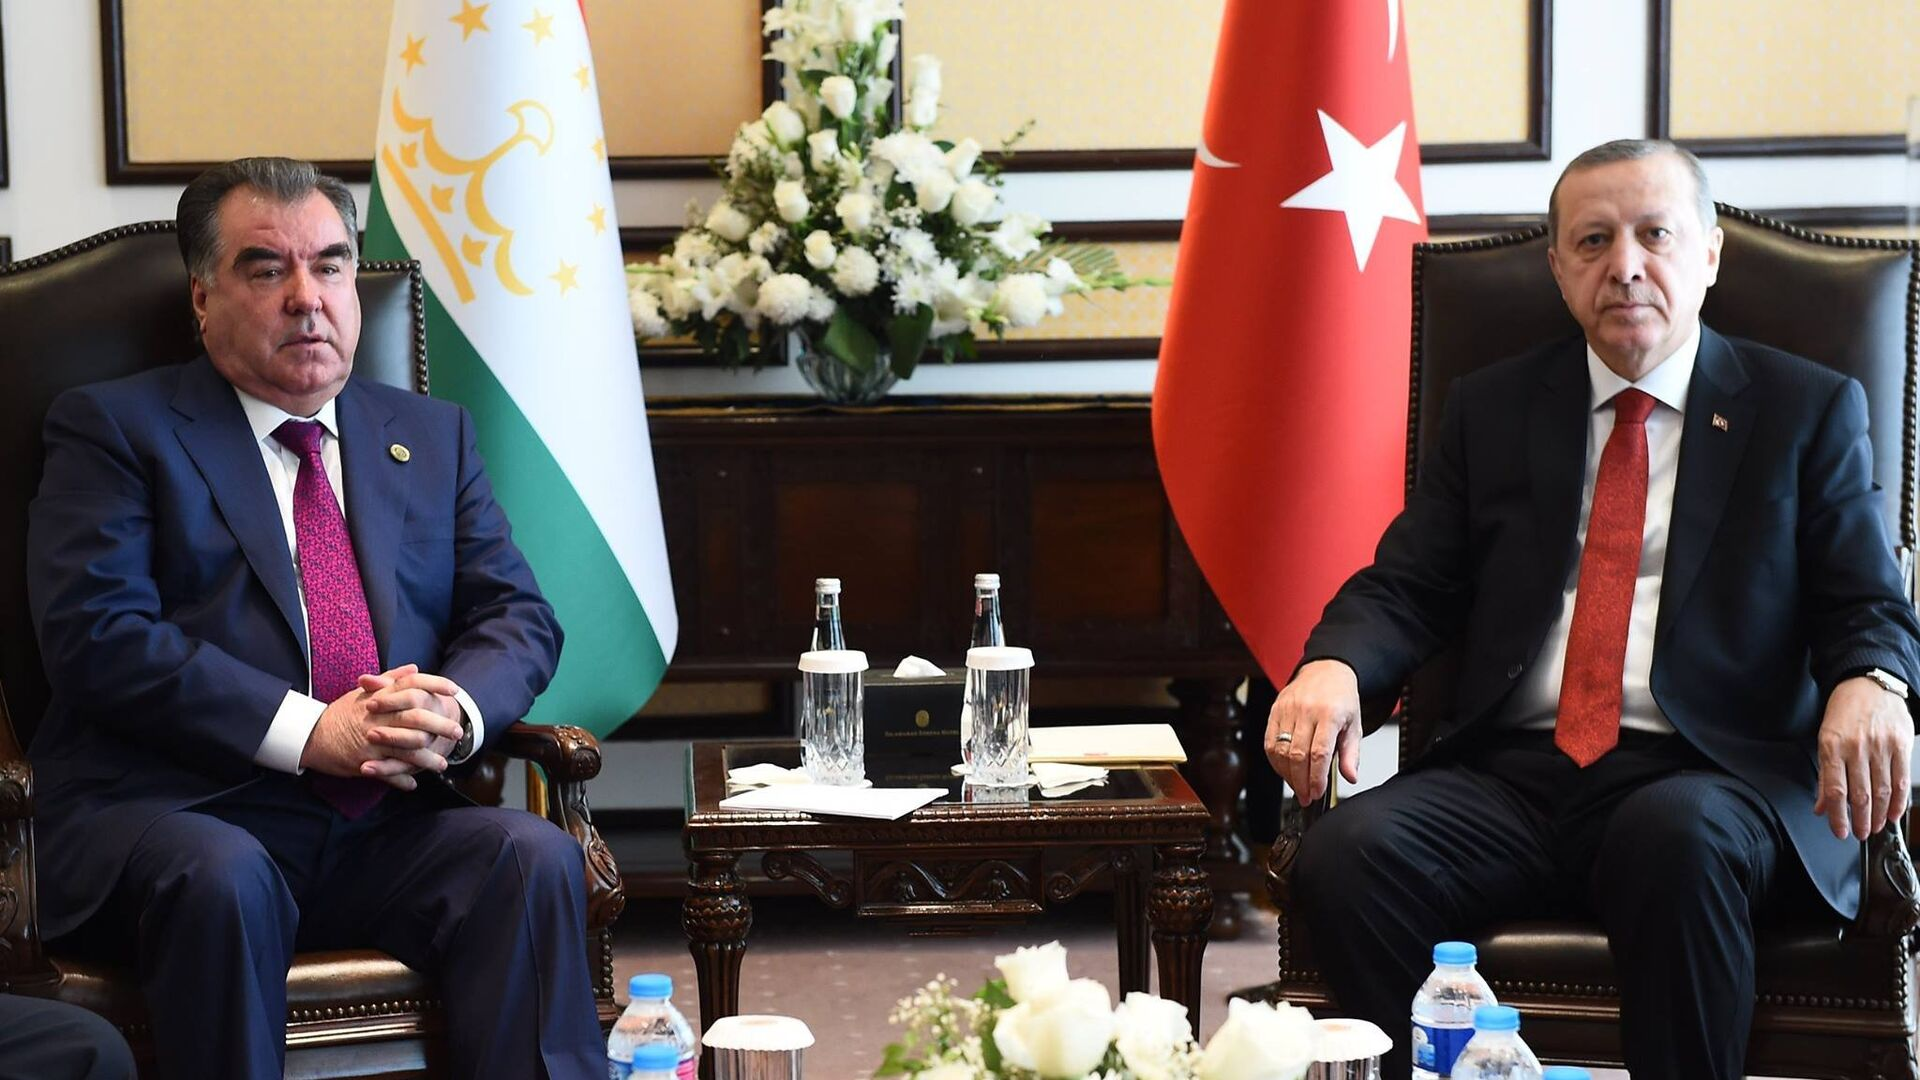 Президенты Таджикистана и Турции Эмомали Рахмон и Тайип Эрдоган - Sputnik Таджикистан, 1920, 19.08.2021